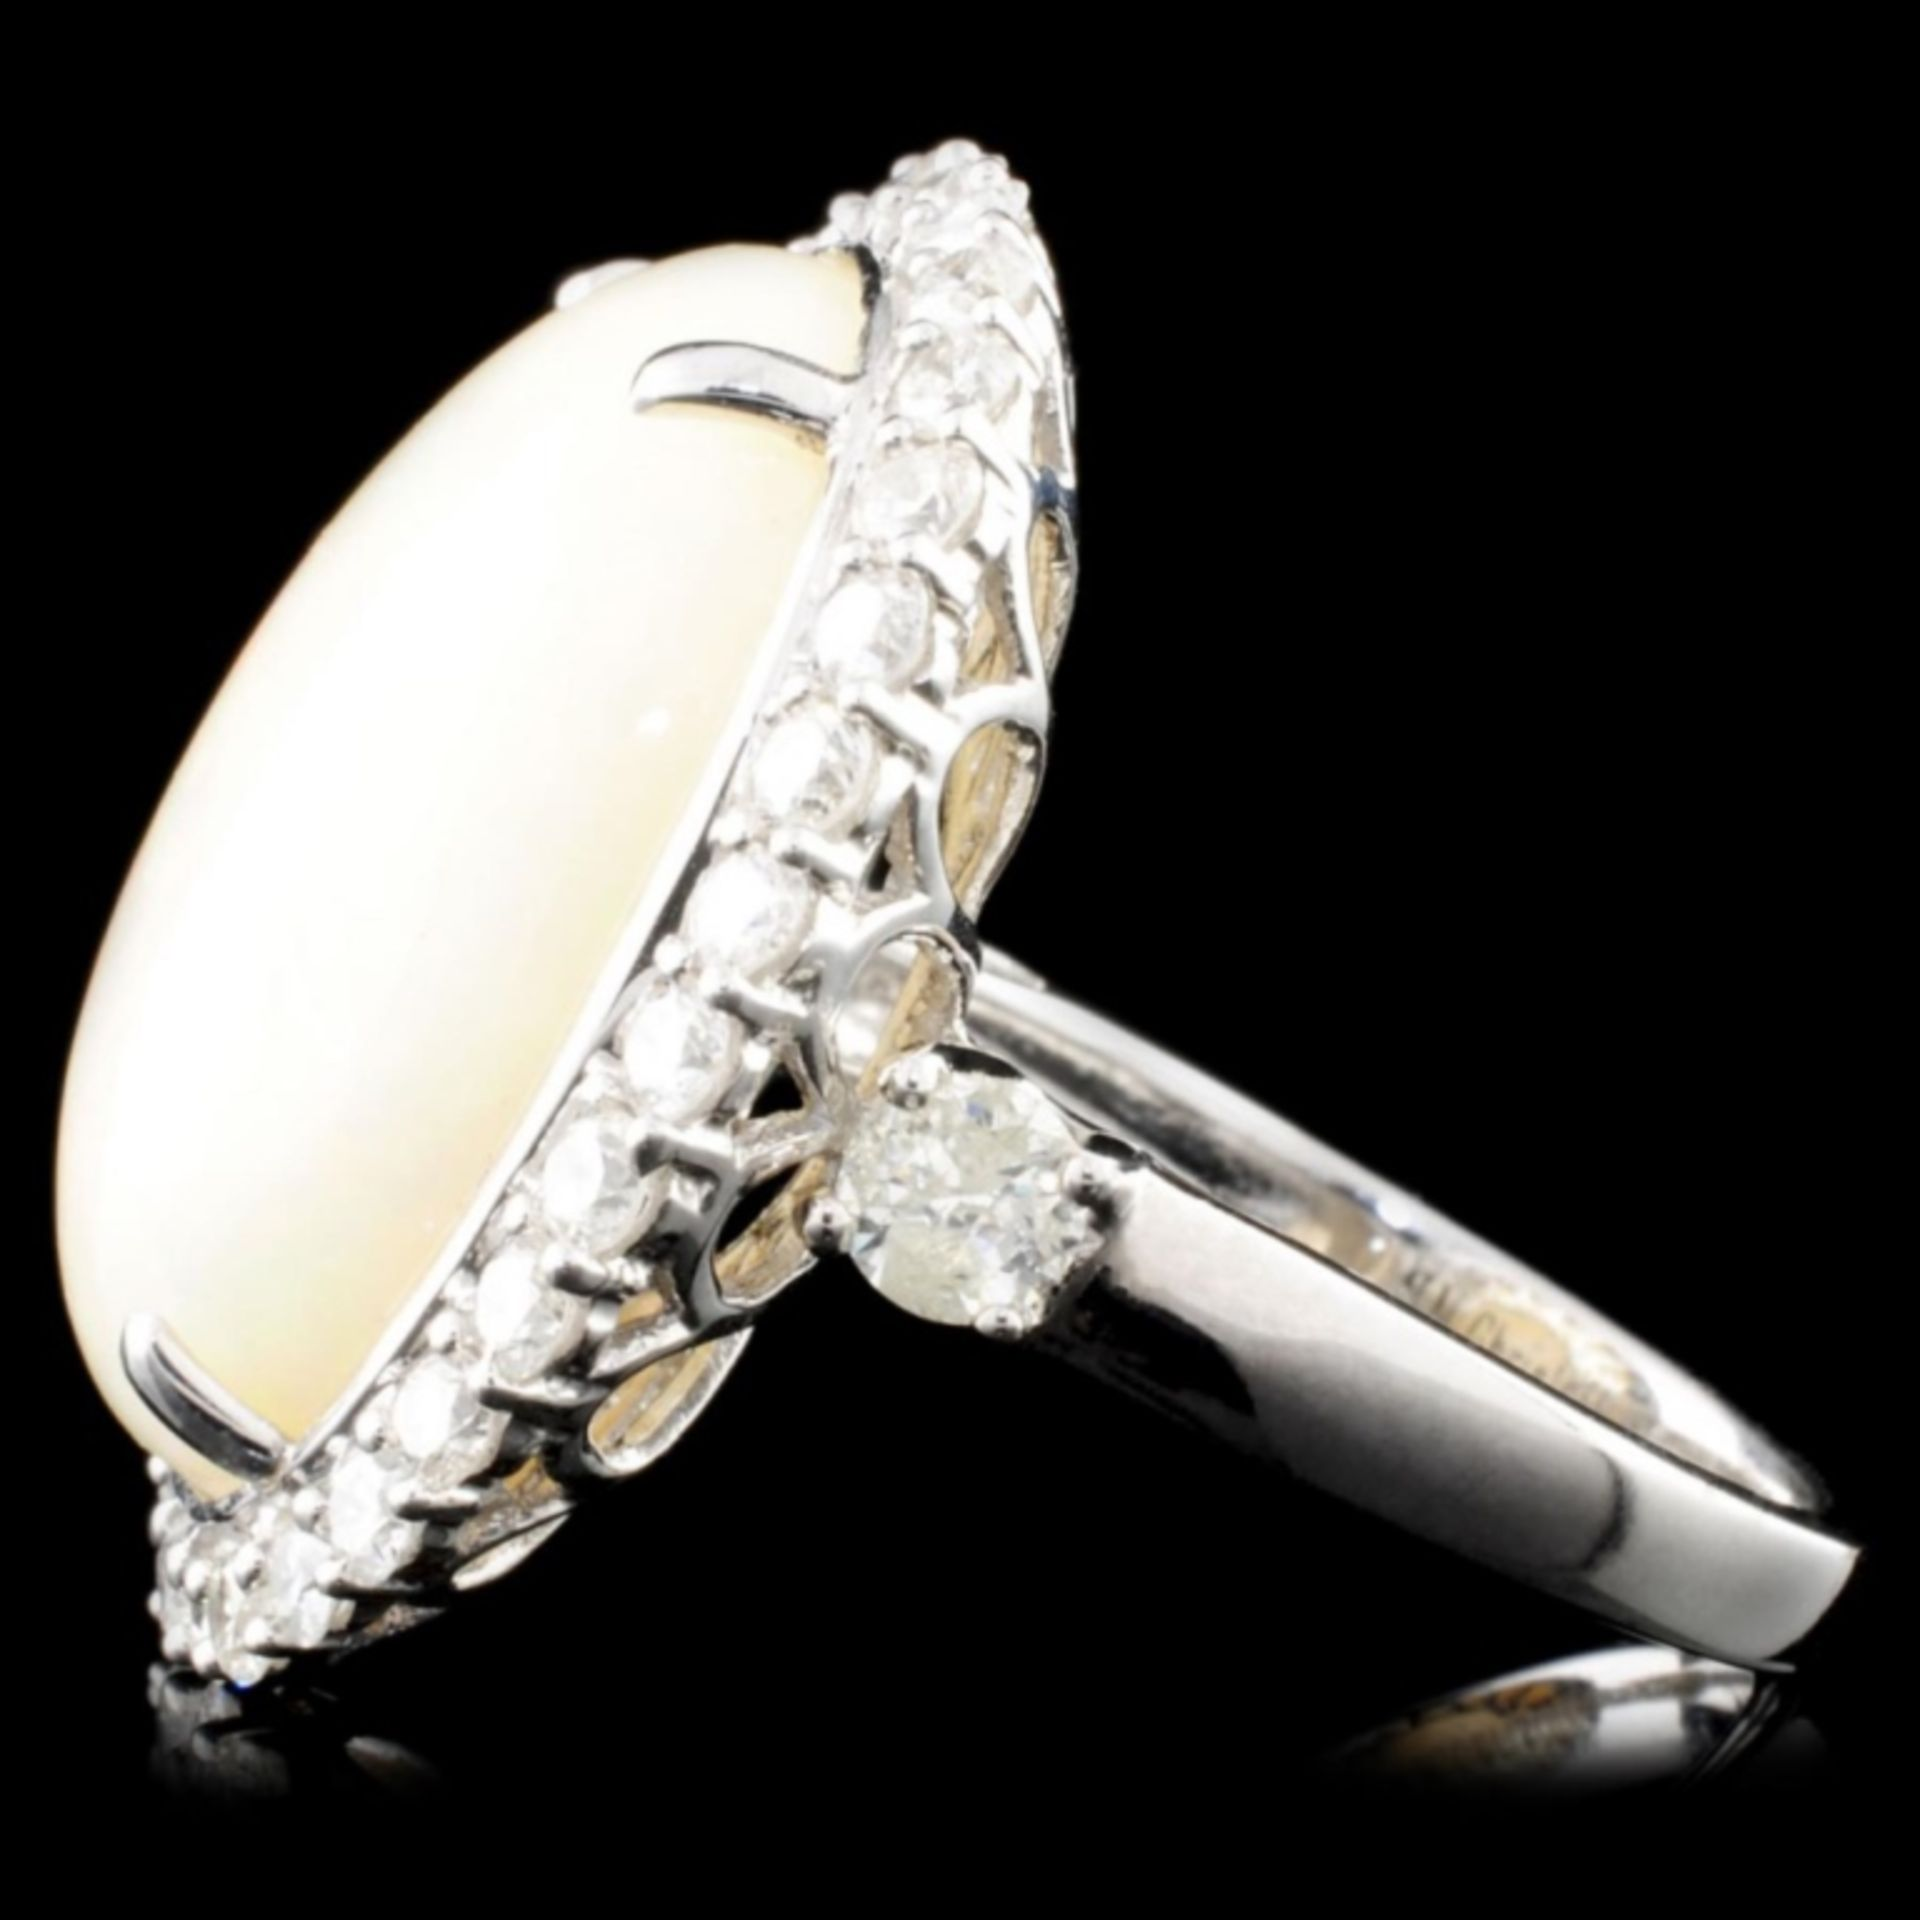 14K Gold 13.31ct Opal & 1.45ctw Diamond Ring - Image 3 of 3